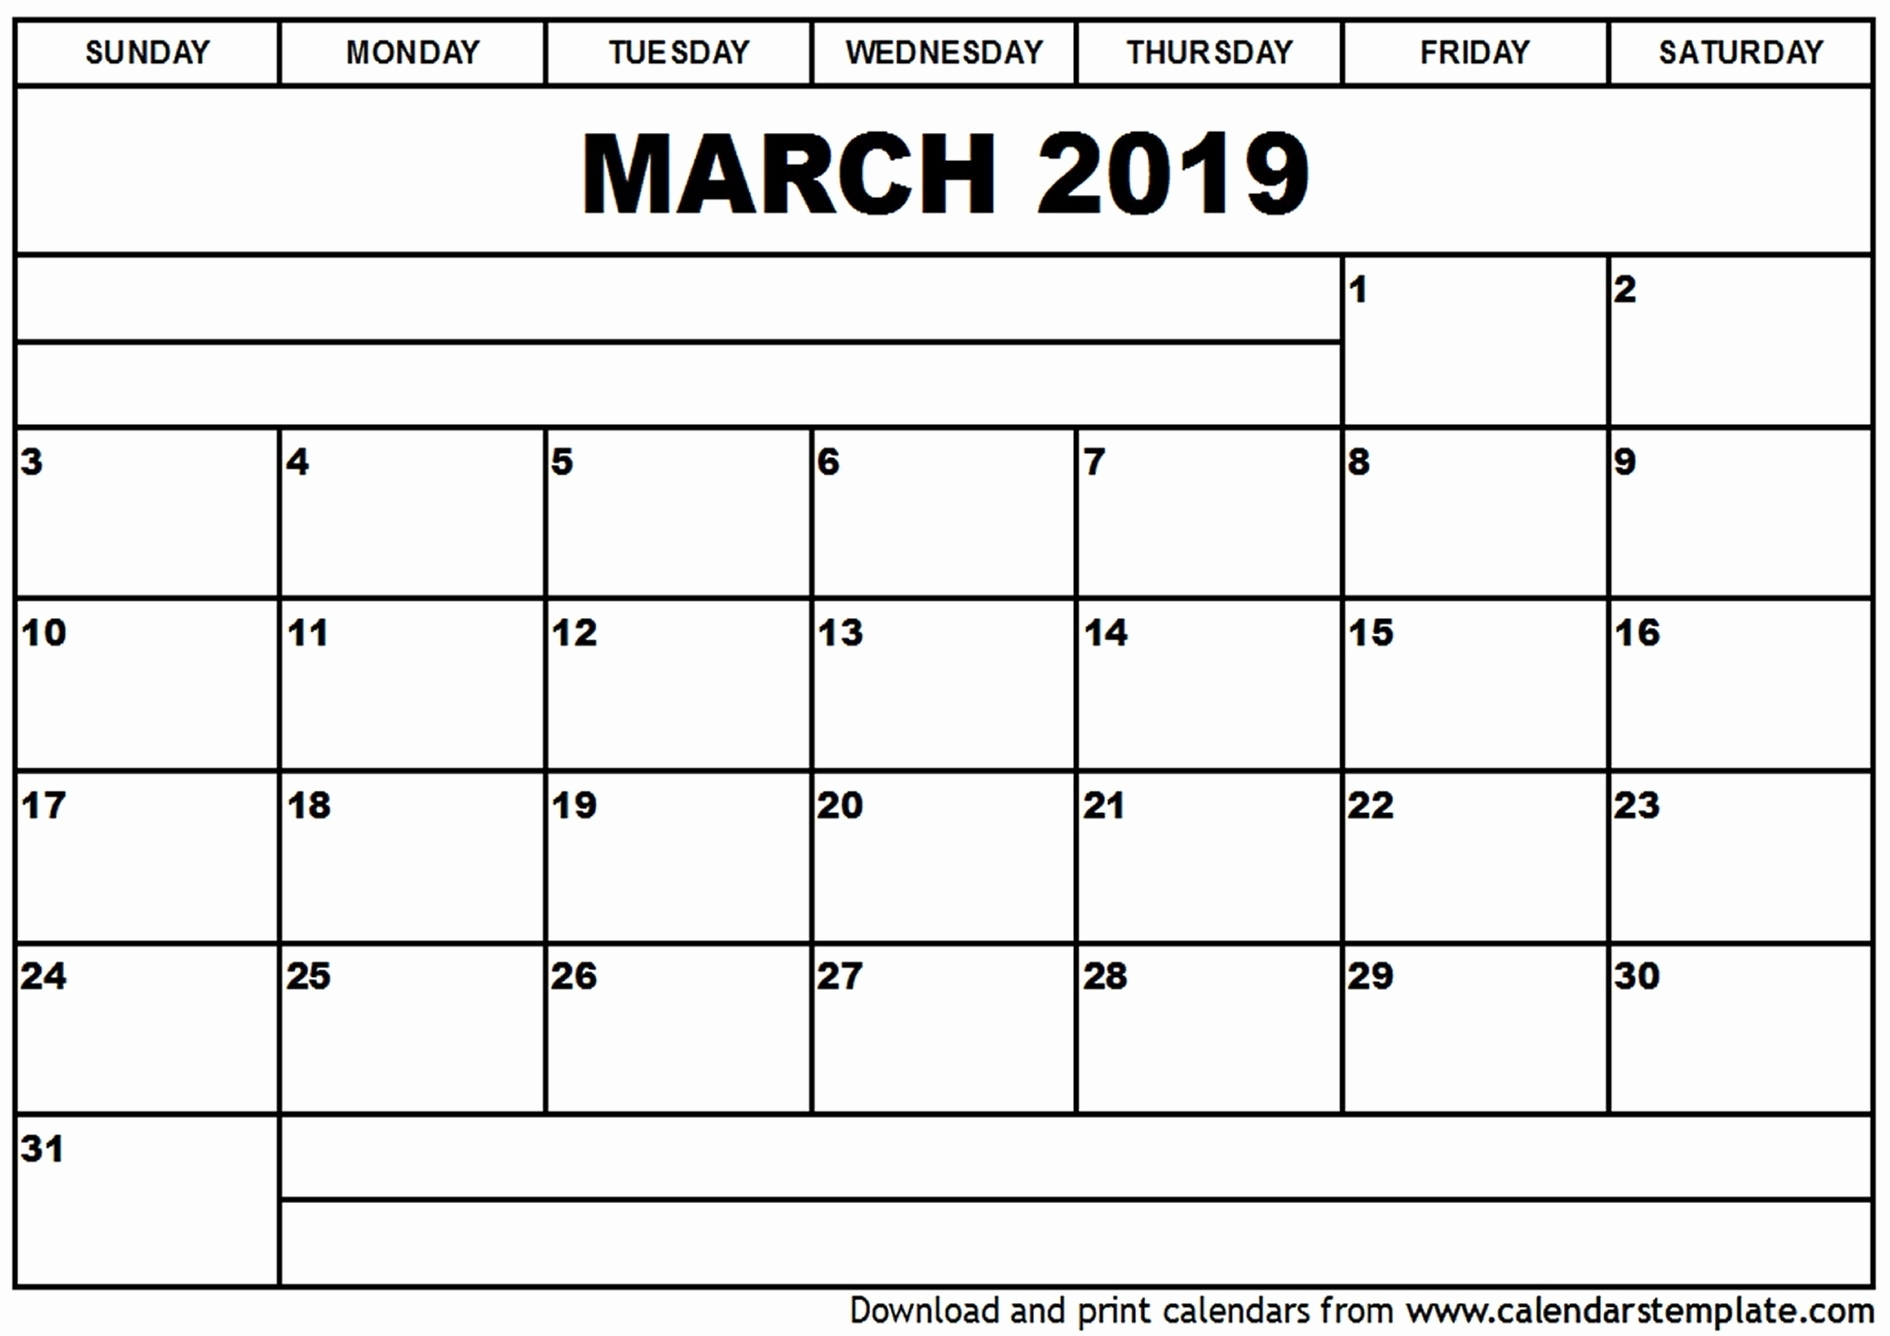 Monday Thru Friday Calendar 2020 Template  Calendar throughout Free Monday Through Friday Calendar Template